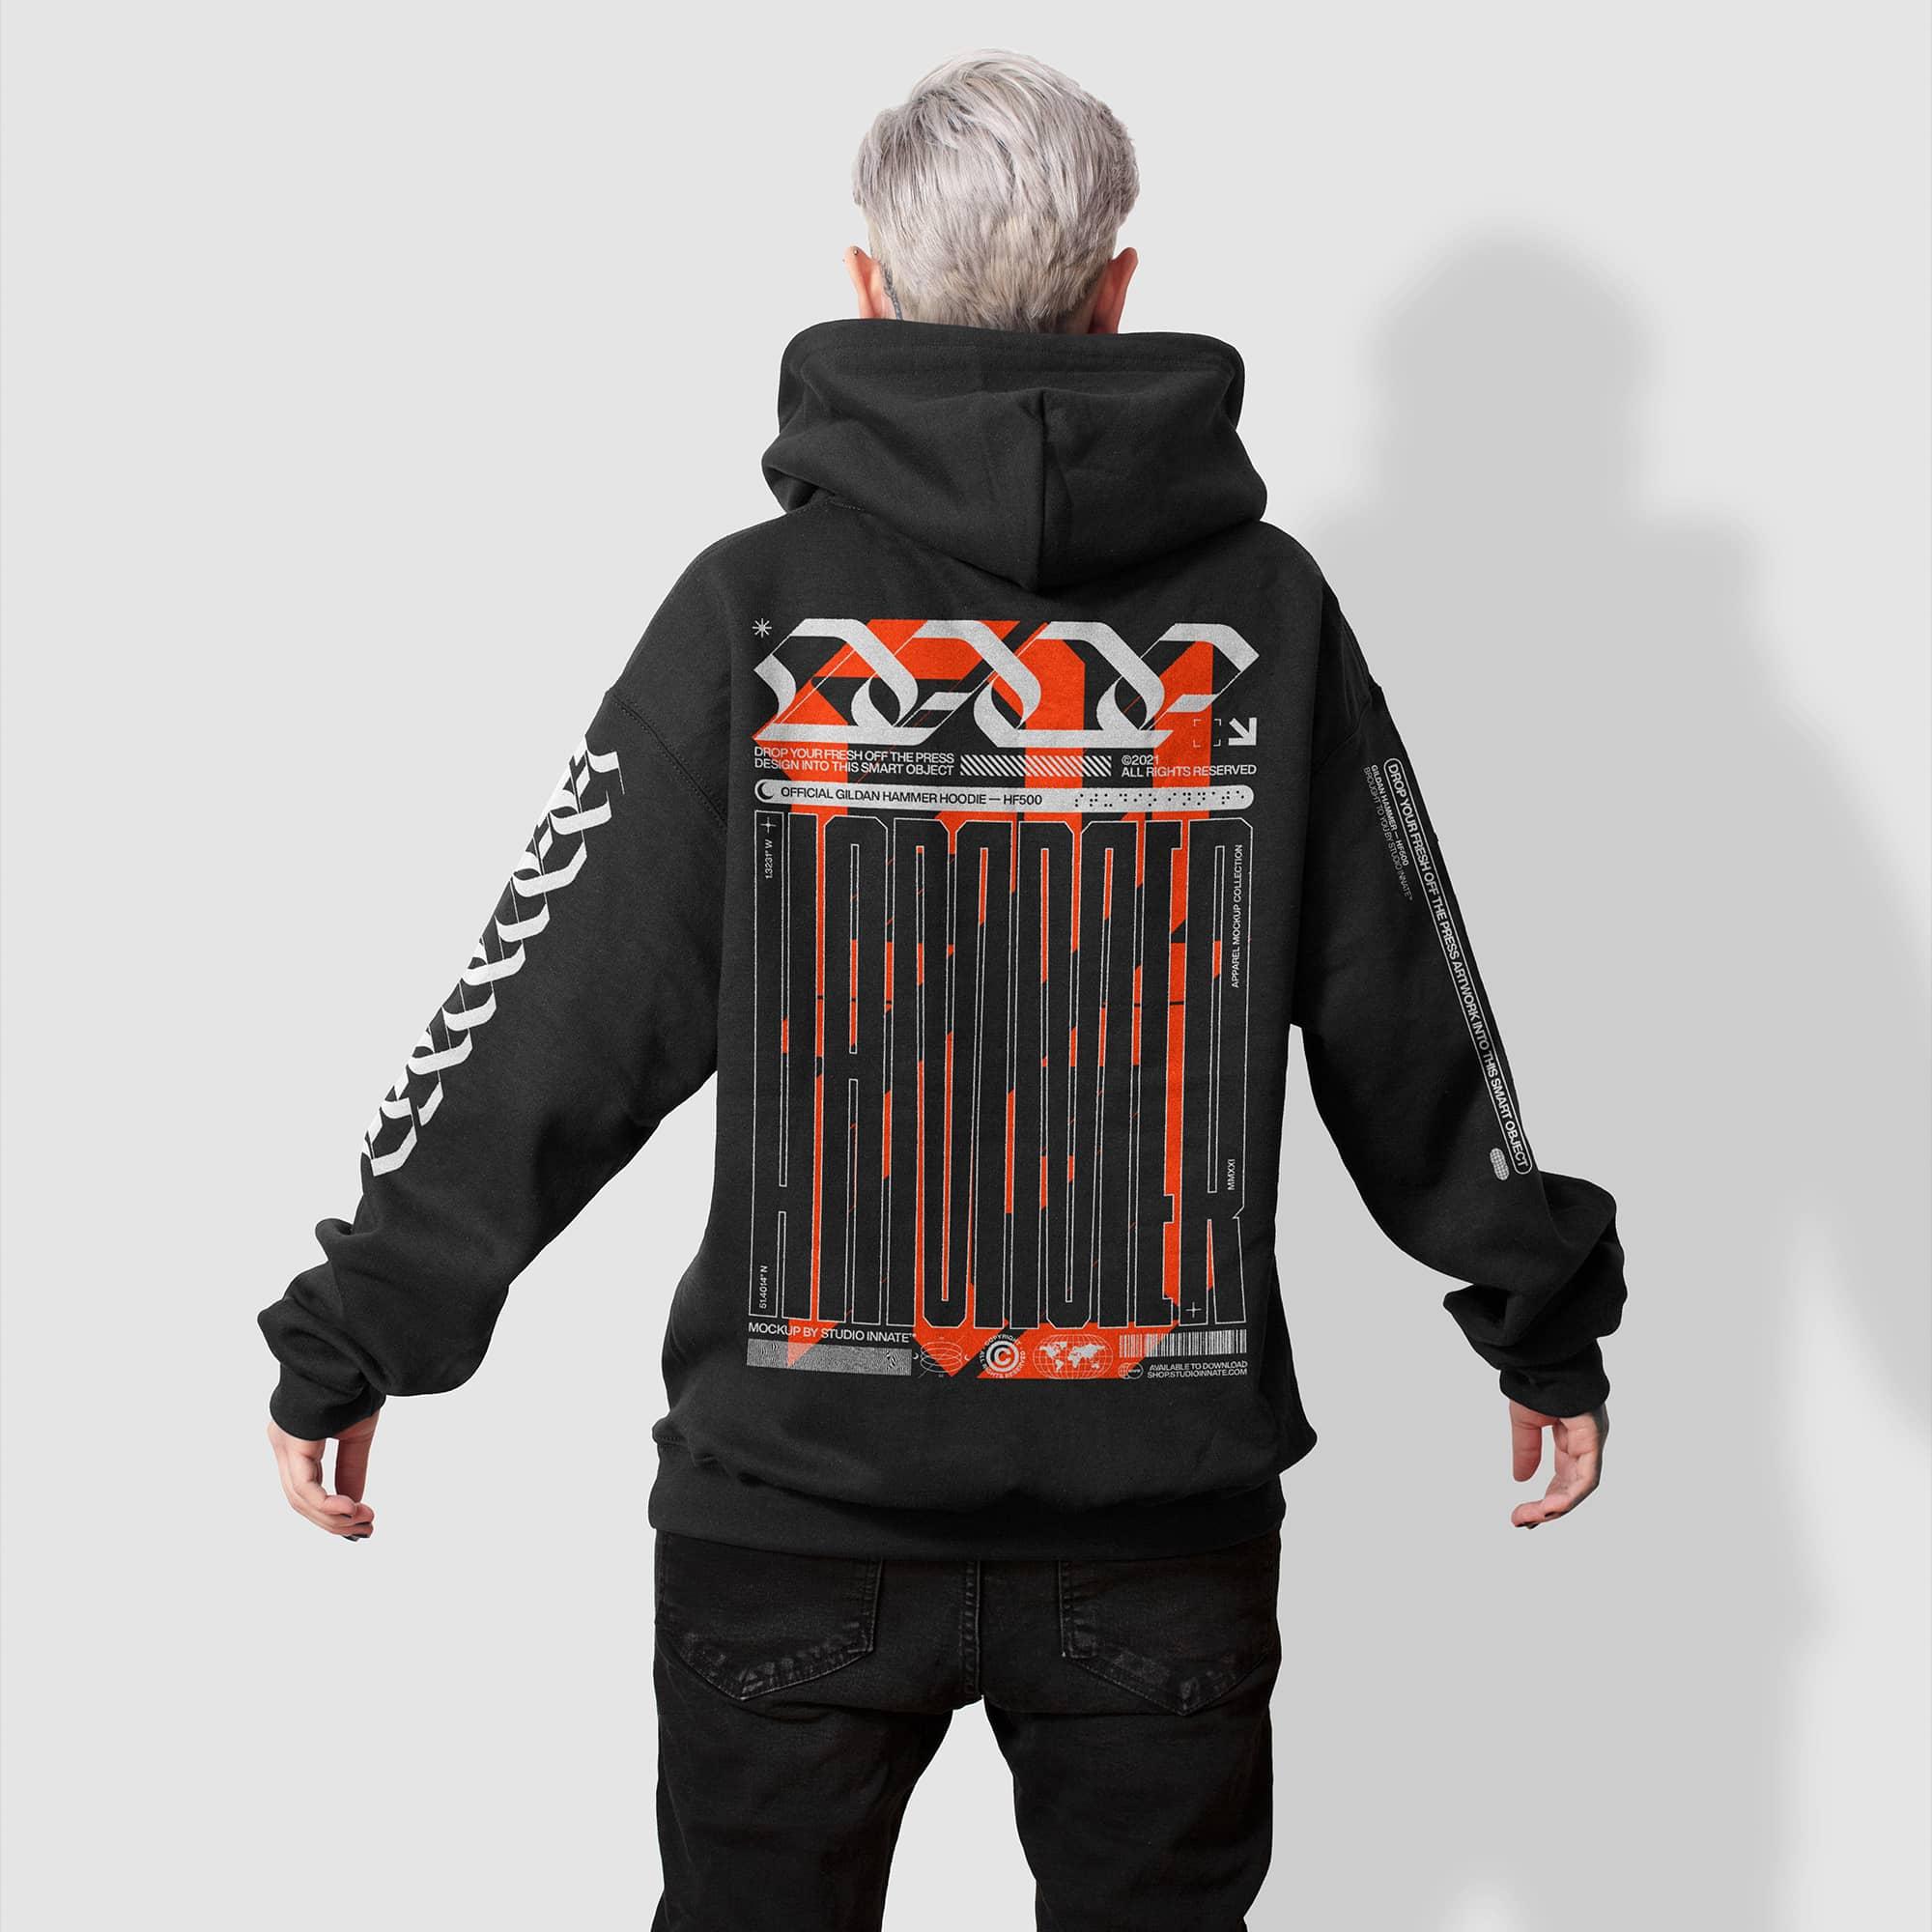 gildan-hammer-hoodie-cover-back